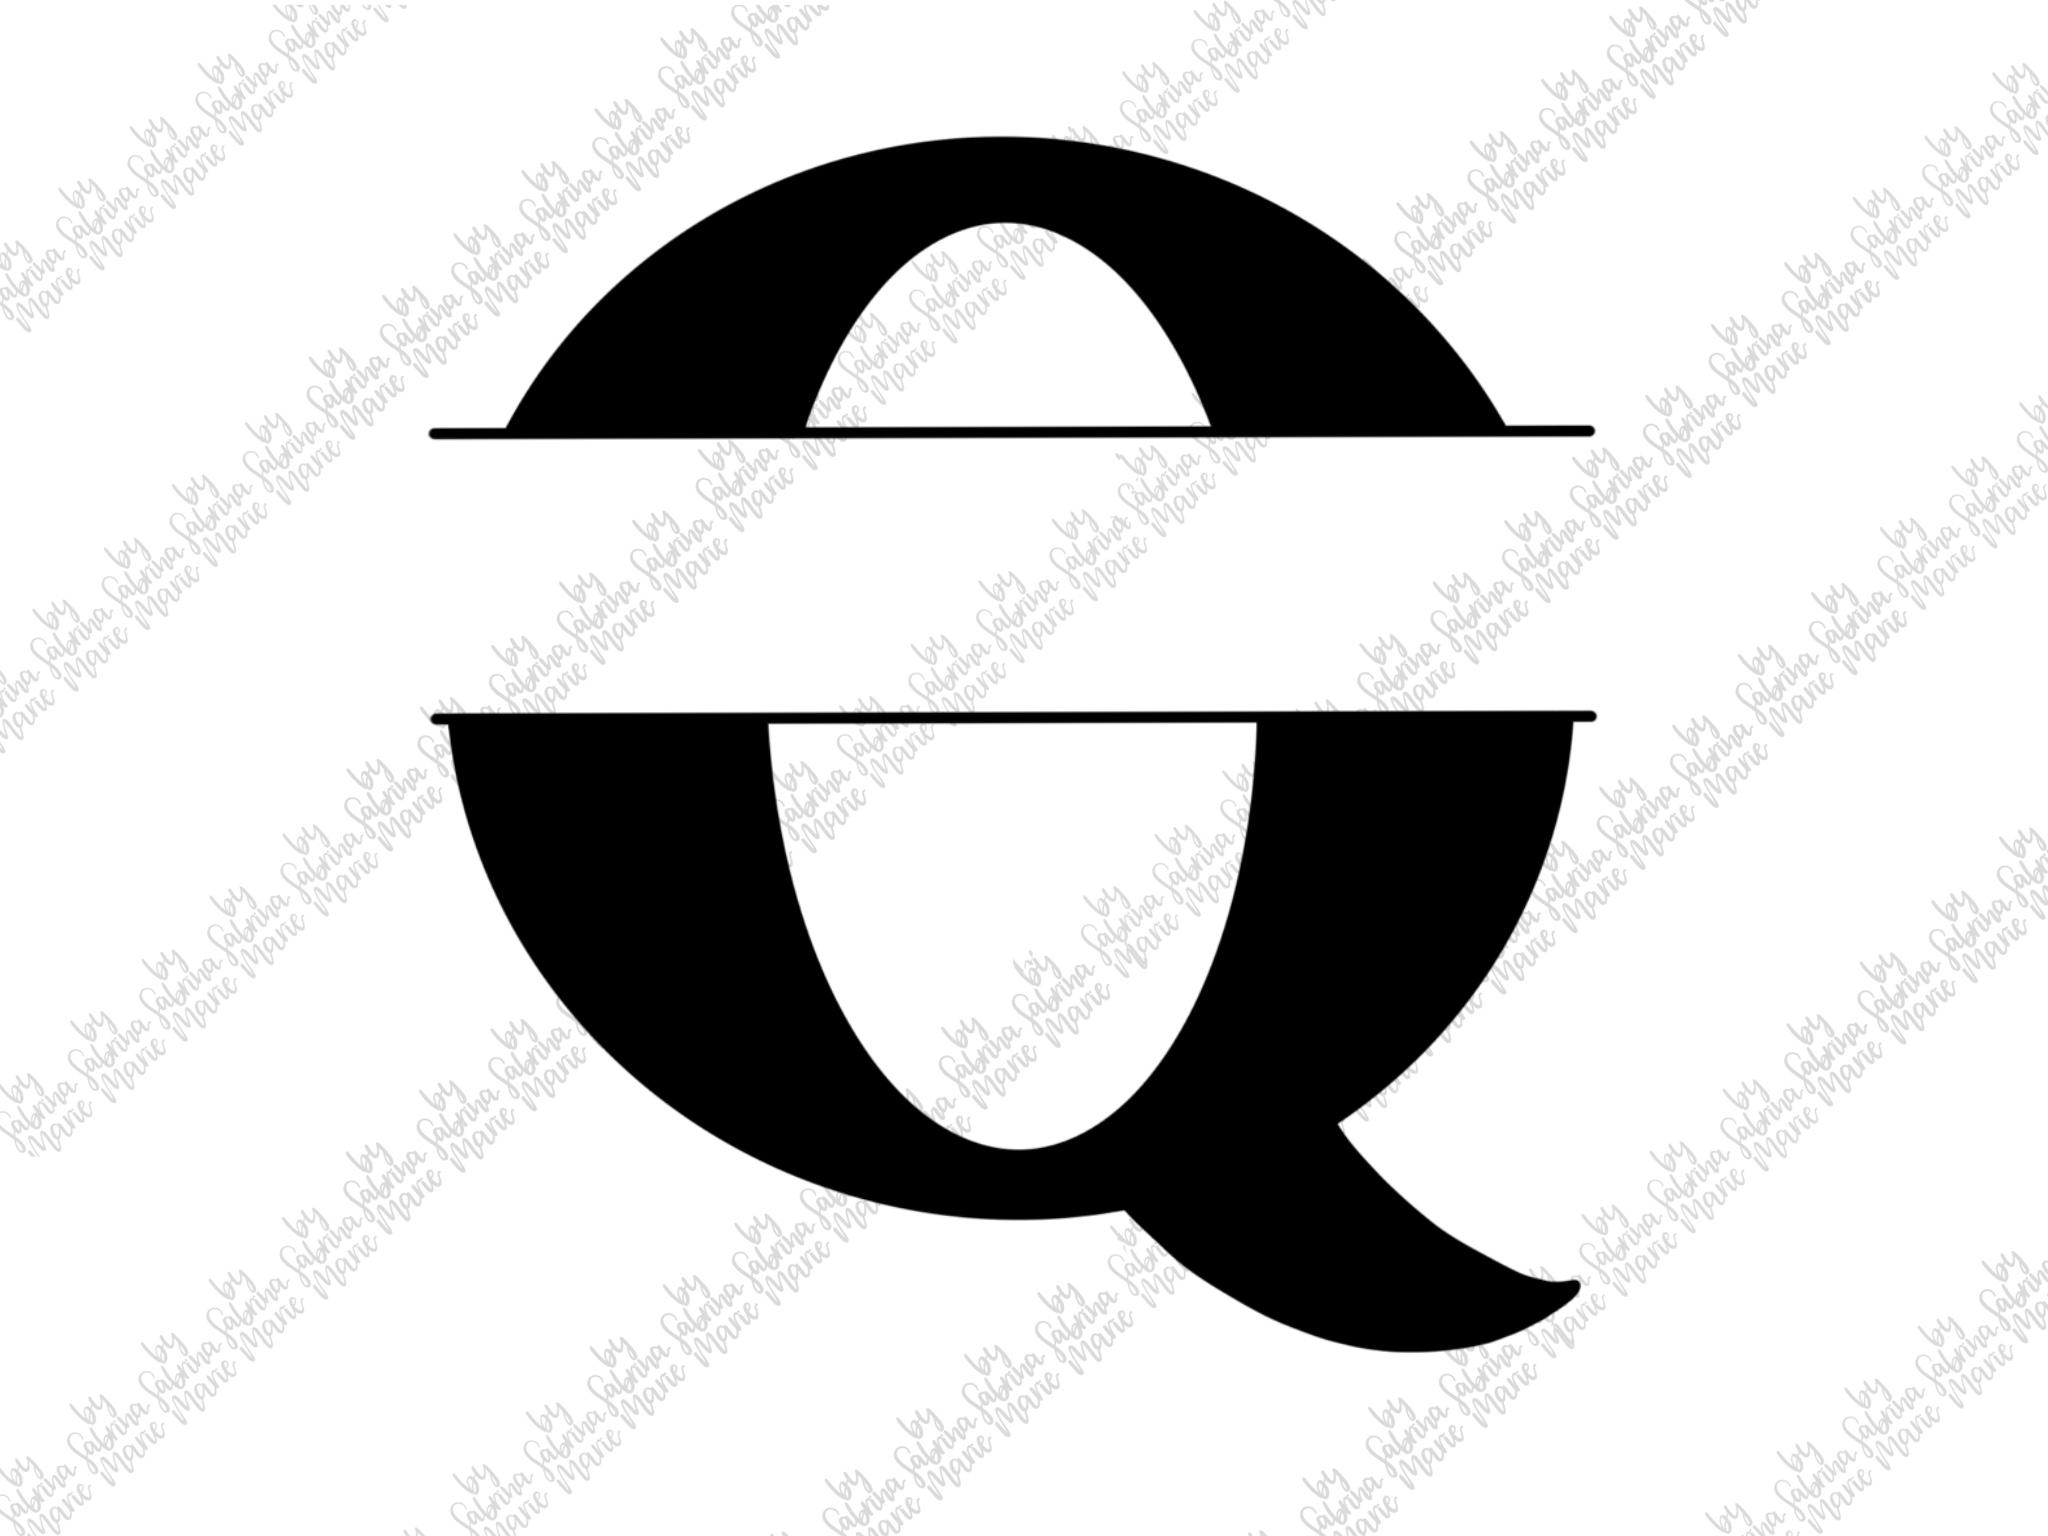 Split Monogram Q - Handdrawn - SVG/PNG example image 2